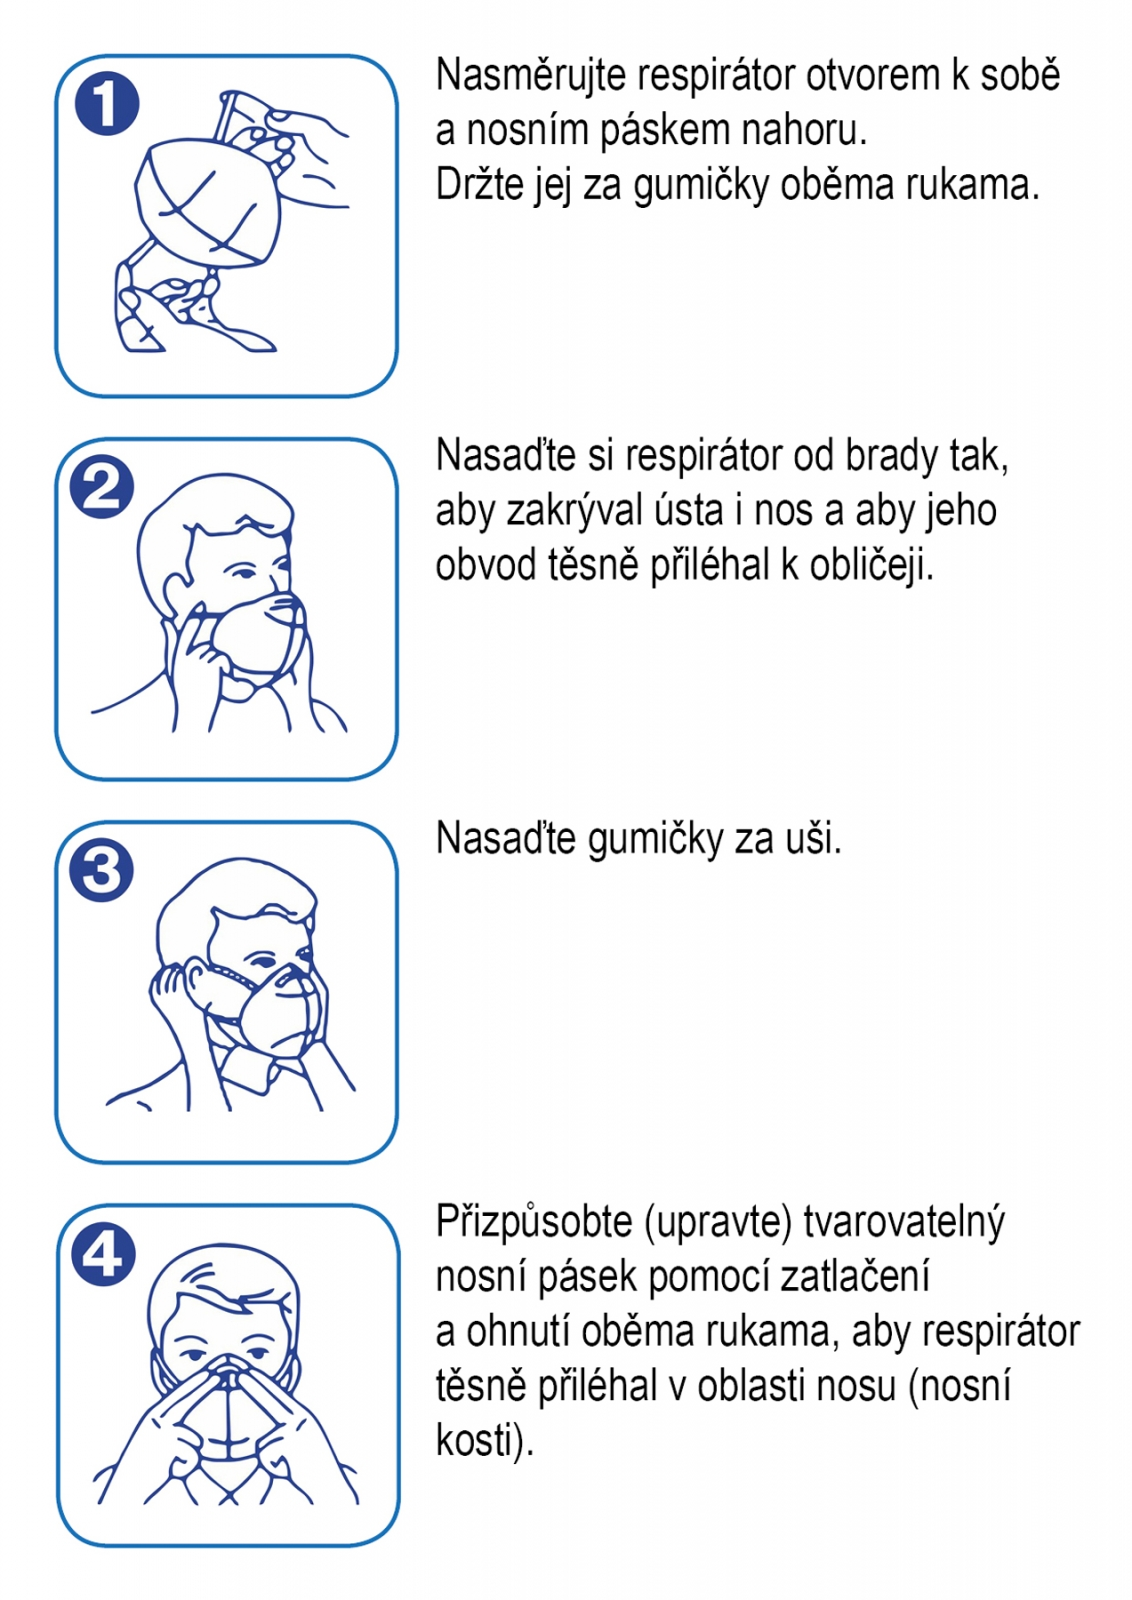 Pouziti_respiratoru_navod